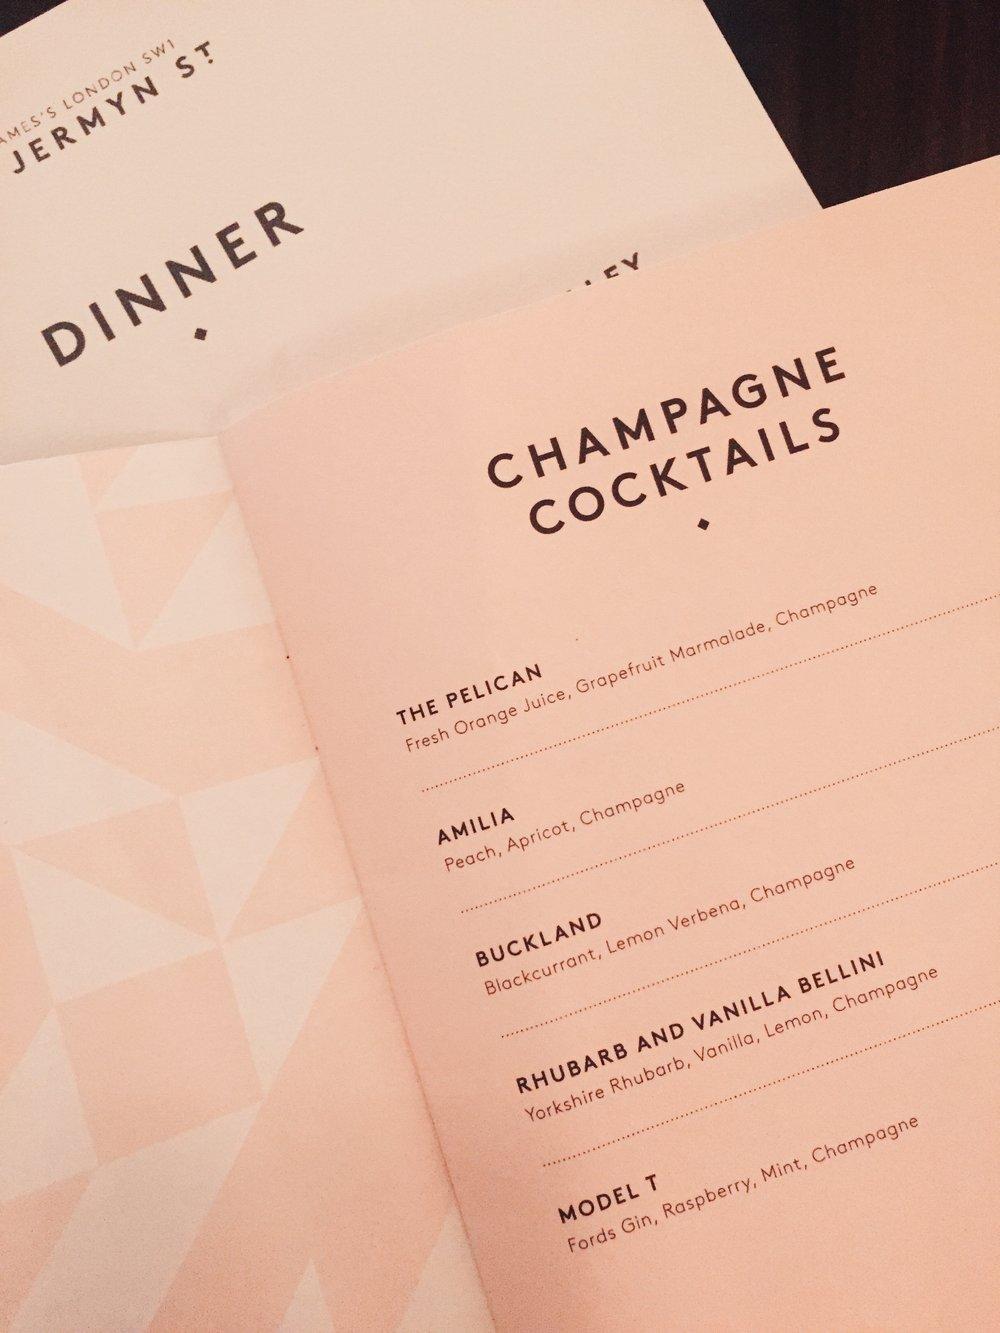 The menus at 45 Jermyn Street at Fortnum and Mason in London